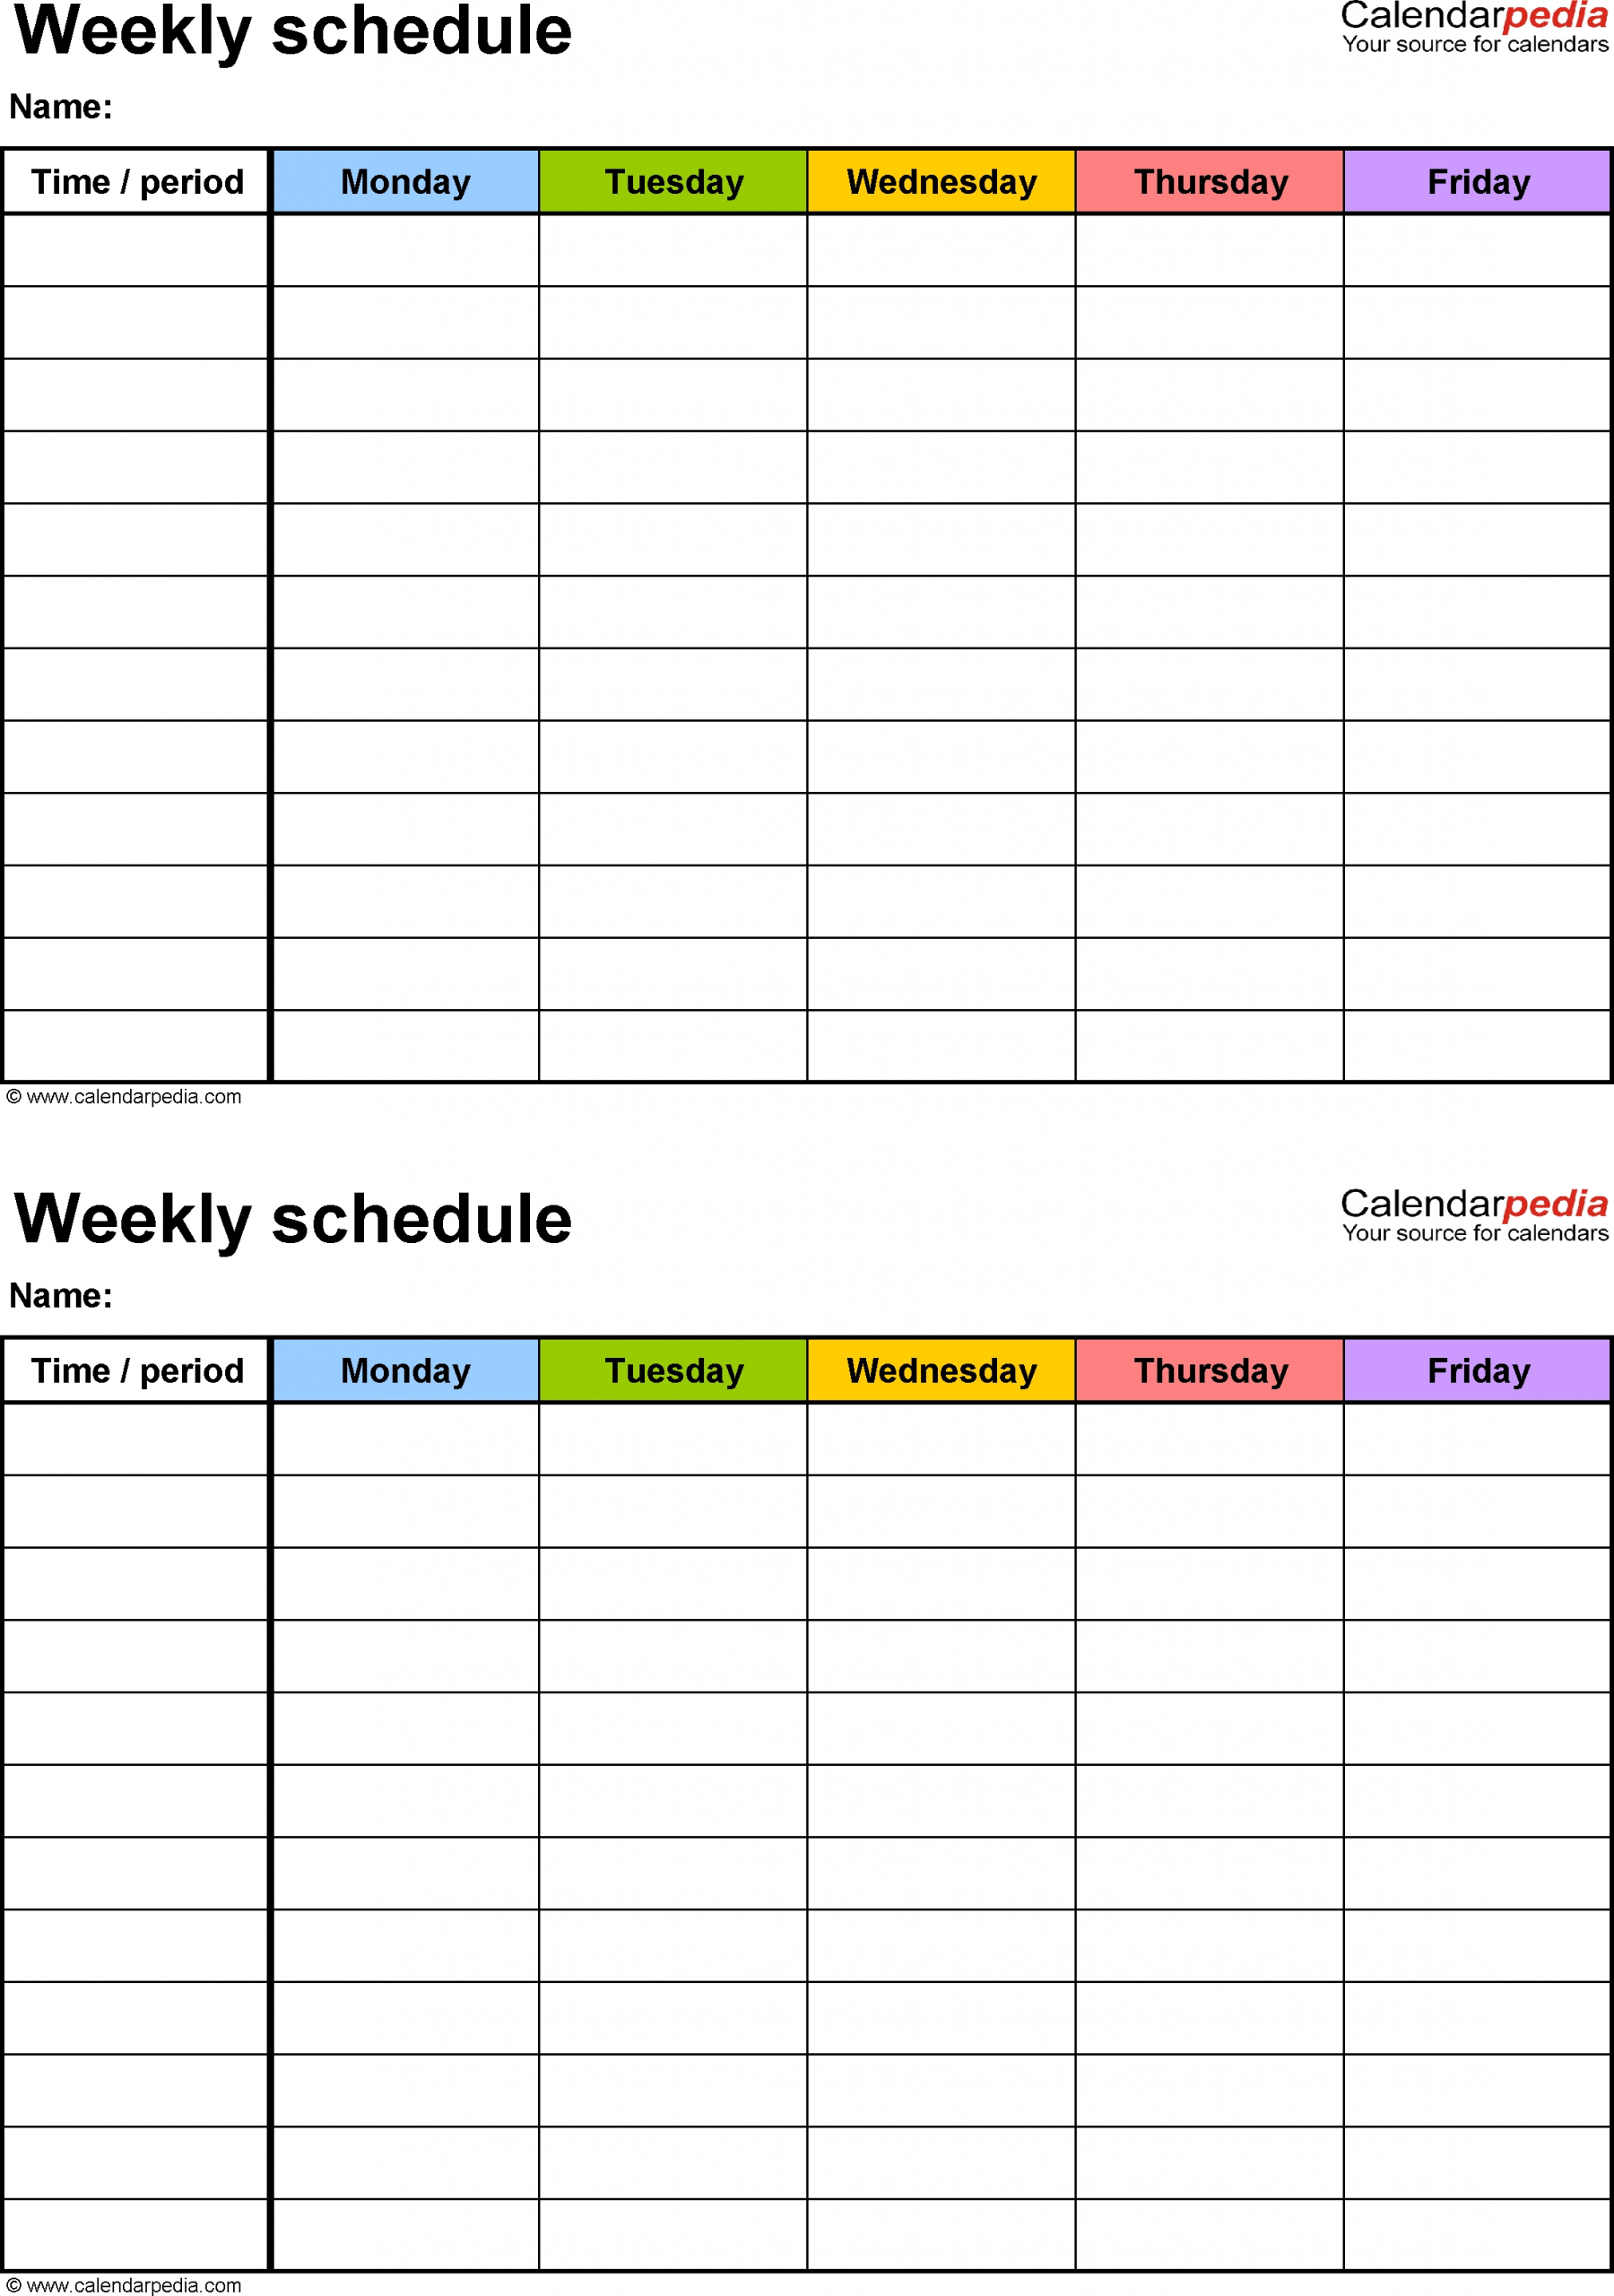 Monday To Friday 2 Week Calendar Template   Calendar Printable 2 Week Calendar